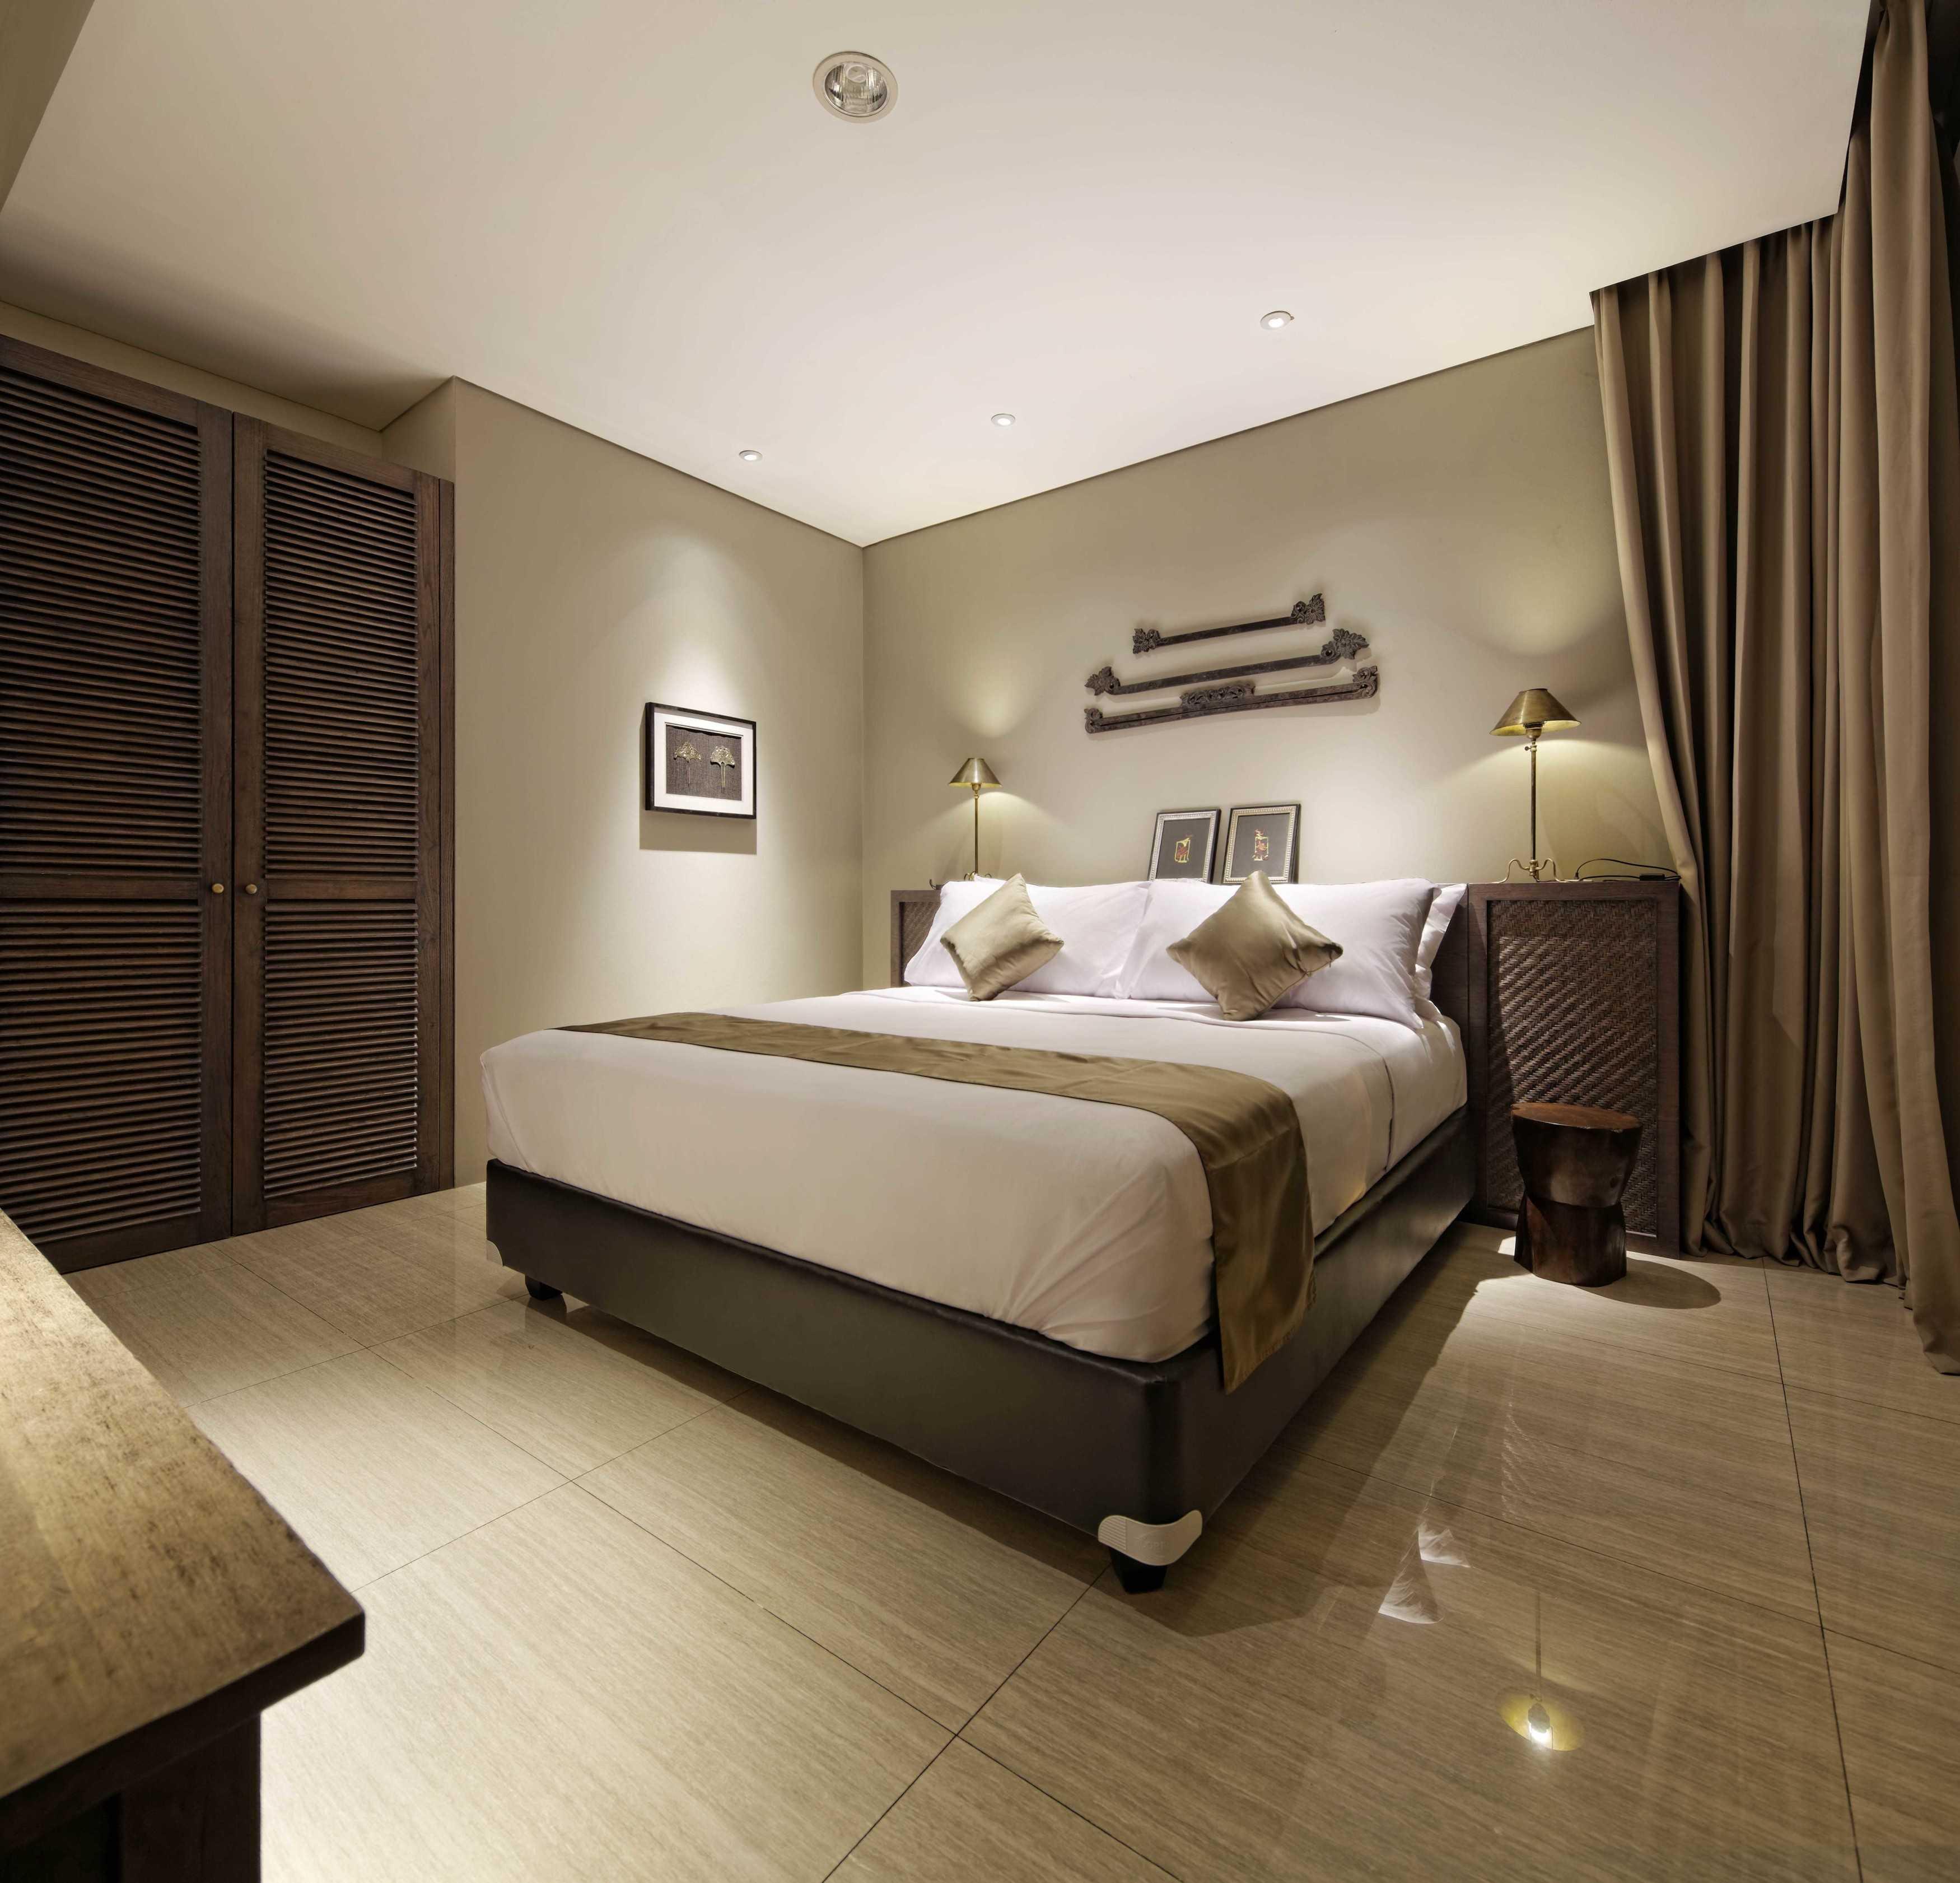 Pt. Modula Habitat At Hyarta Yogyakarta Yogyakarta Bedroom   26897